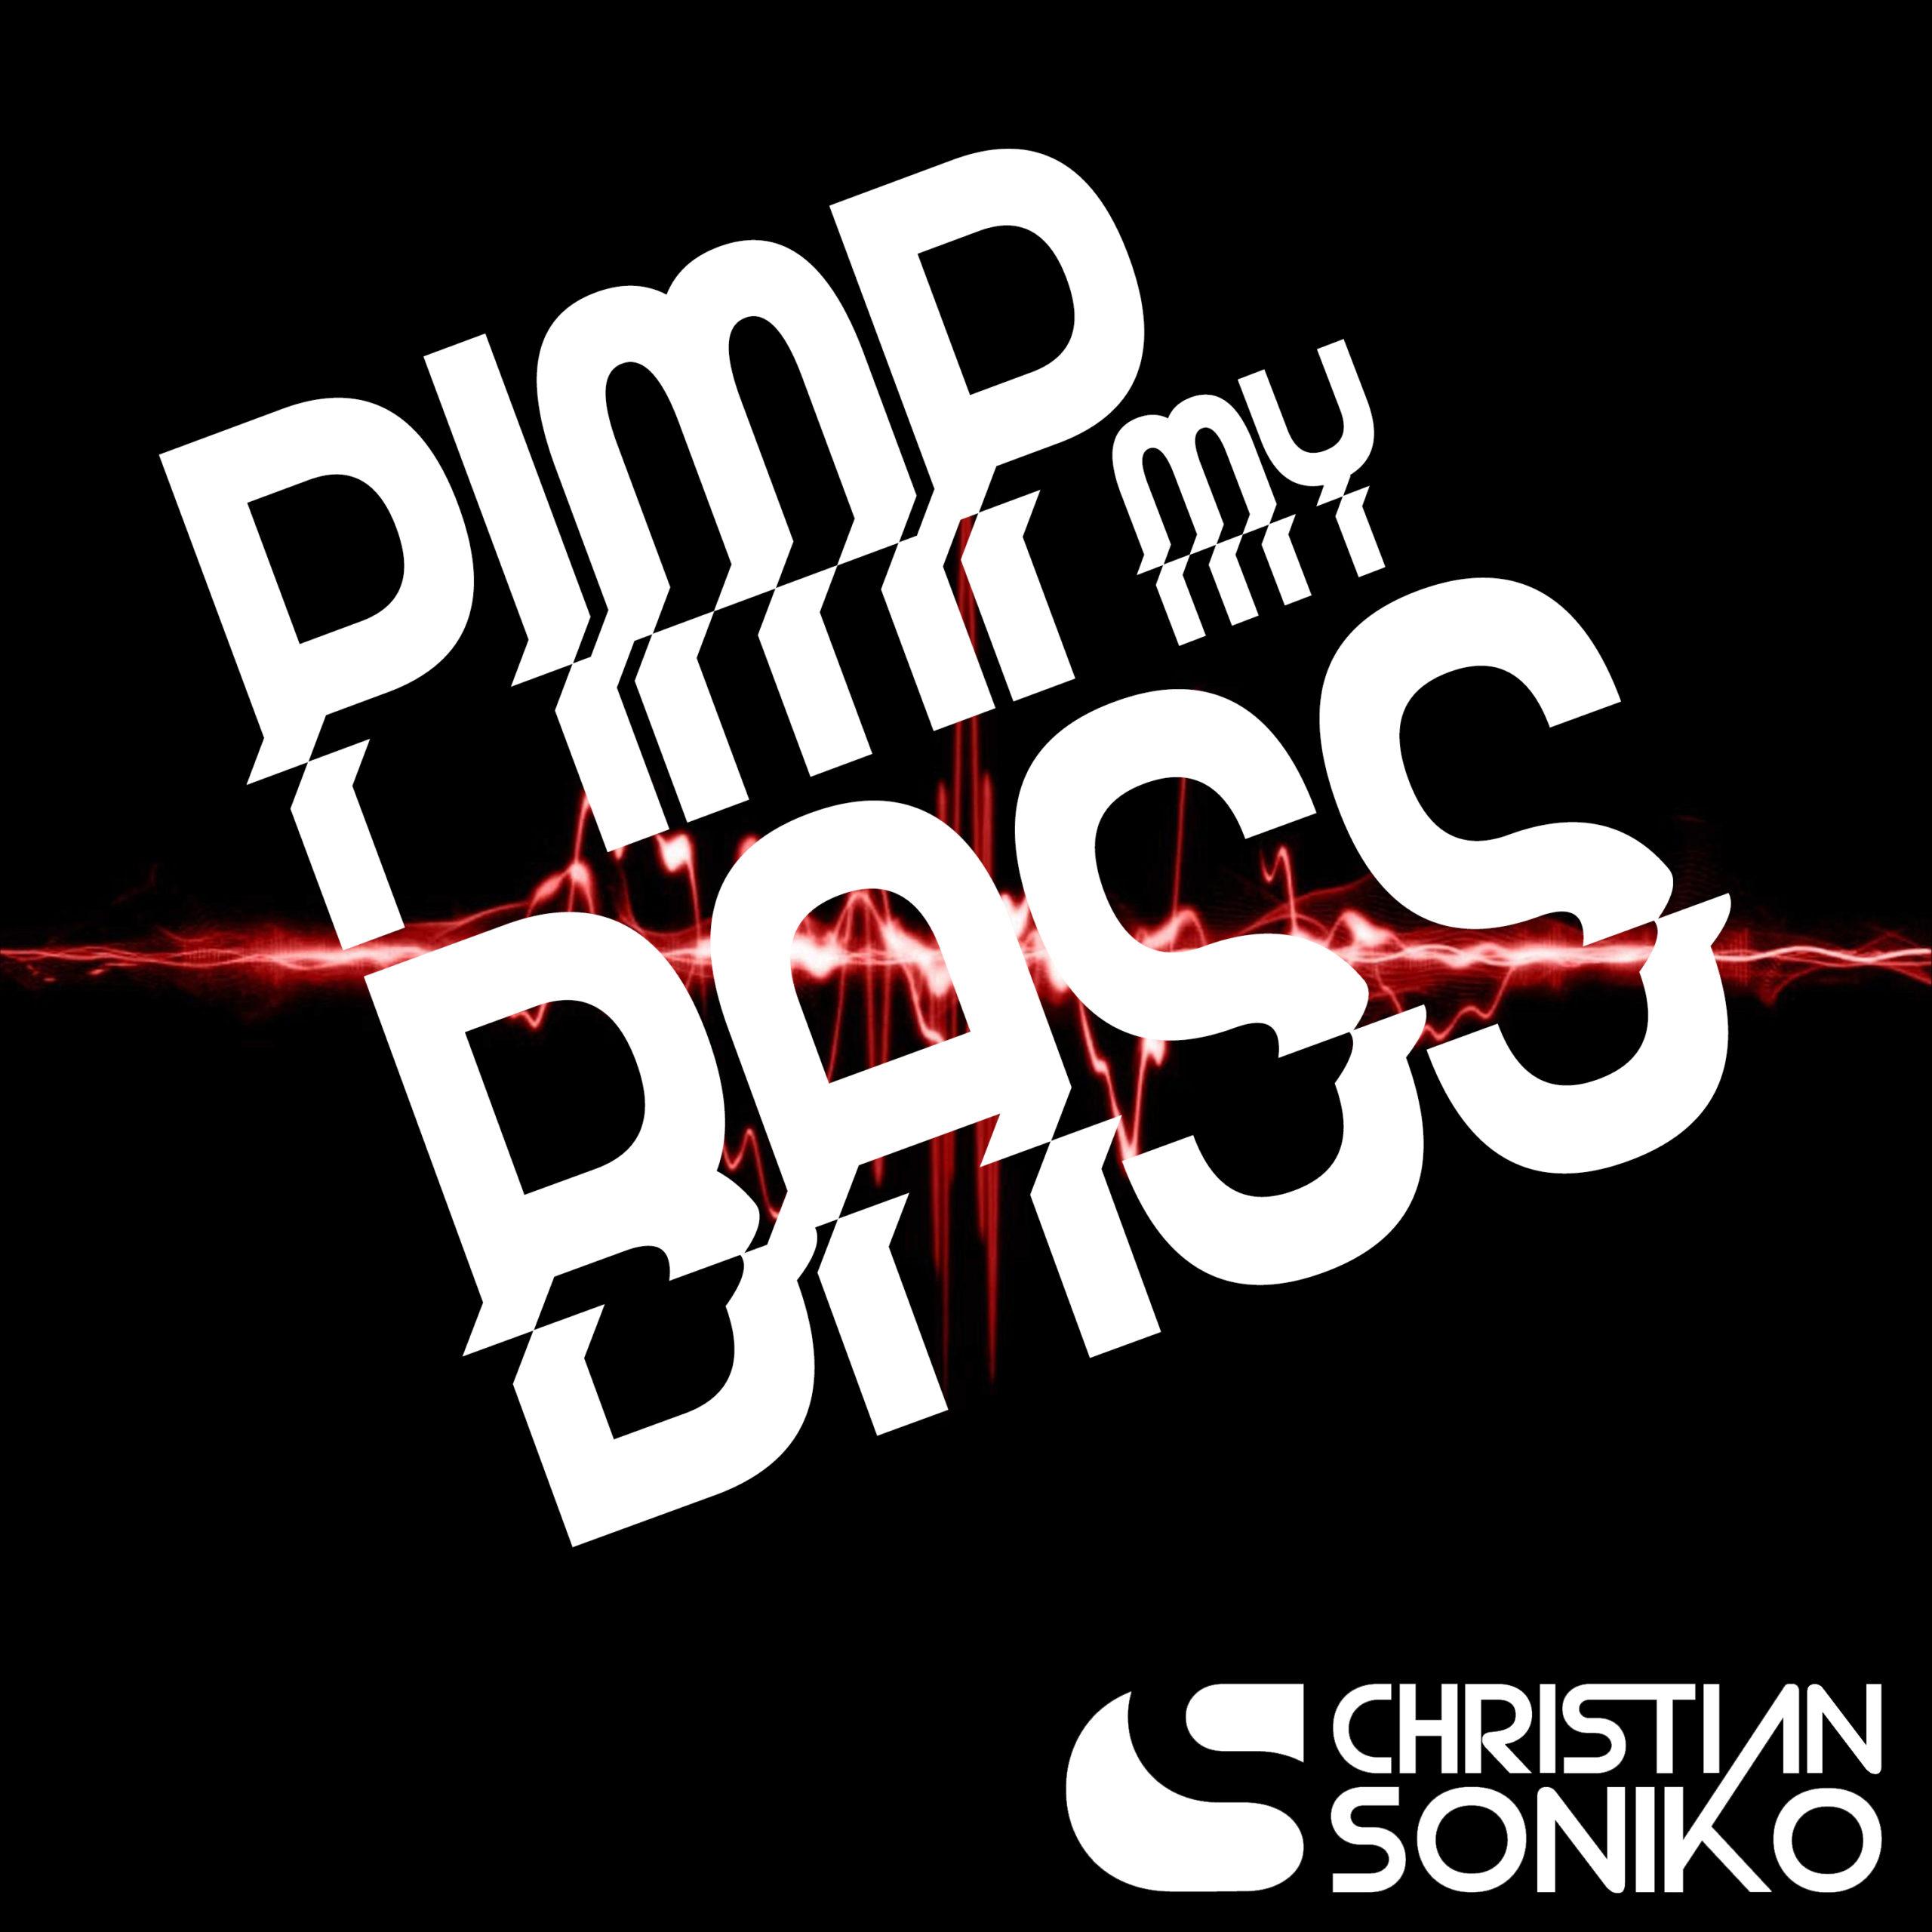 PIMP MY BASS Cover